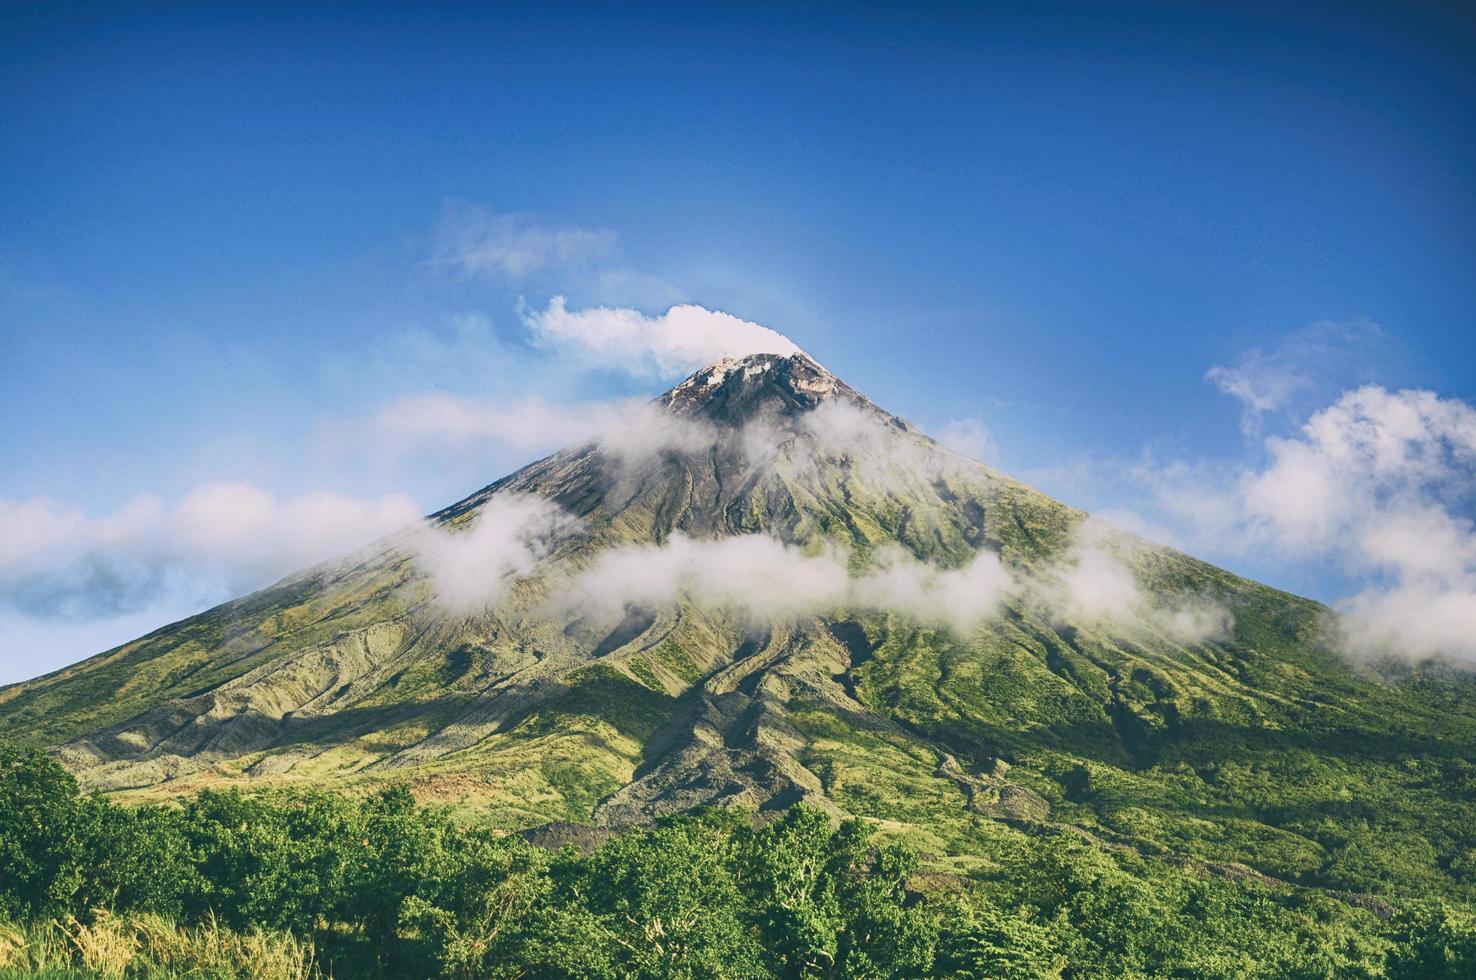 Green mountain under blue sky photo